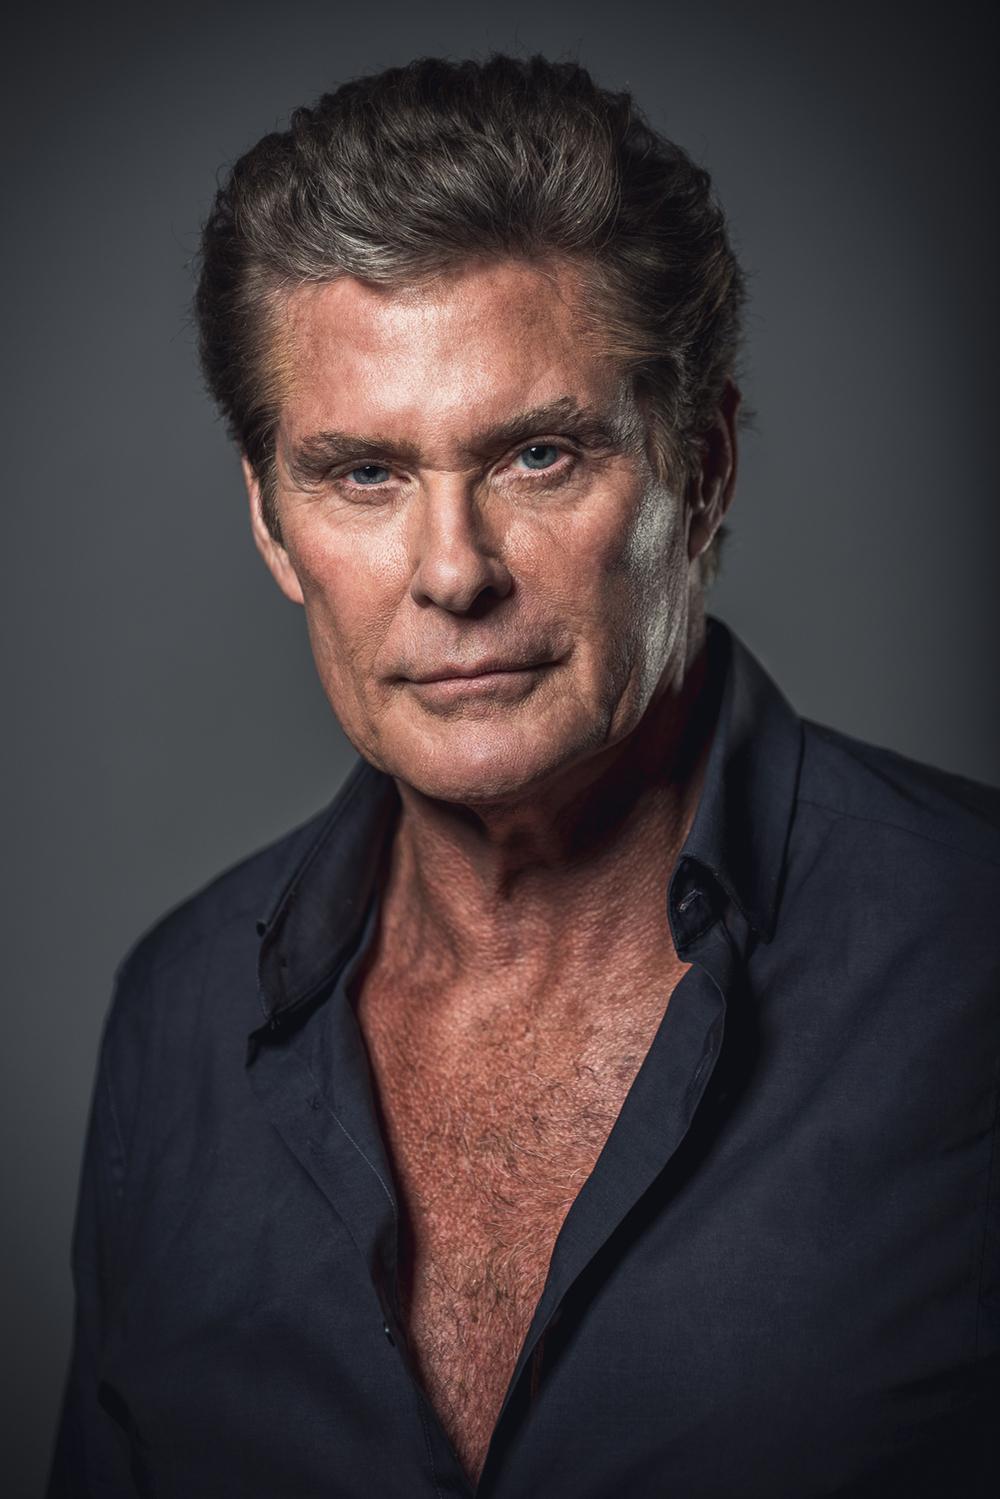 Celebrity Portrait - David Hasselhoff Headshot - Marek Michalek Photography - Hamilton Toronto Niagara Photographer.jpg